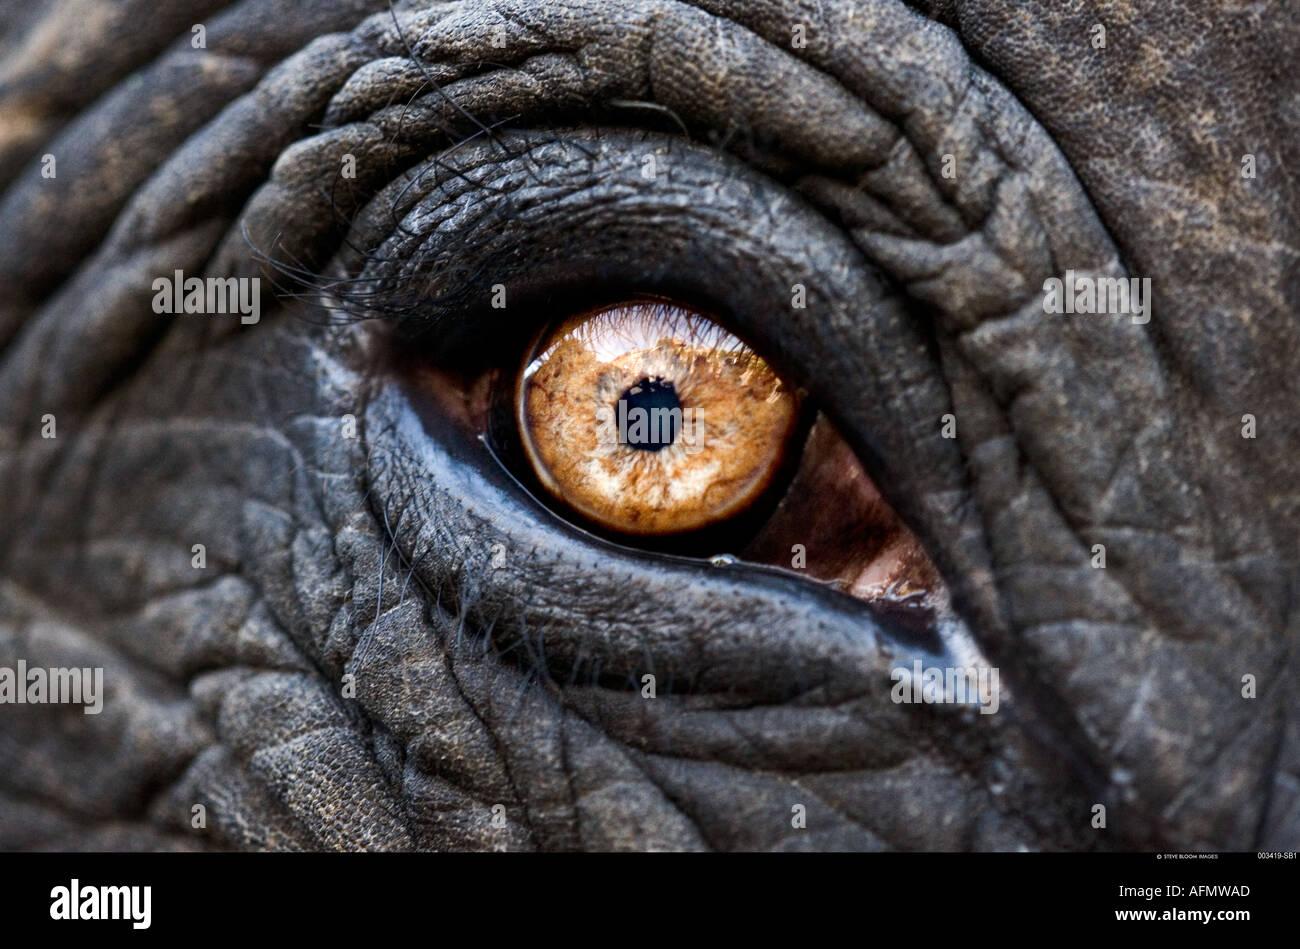 Close up of eye of an Indian elephant Jaipur India Stock Foto